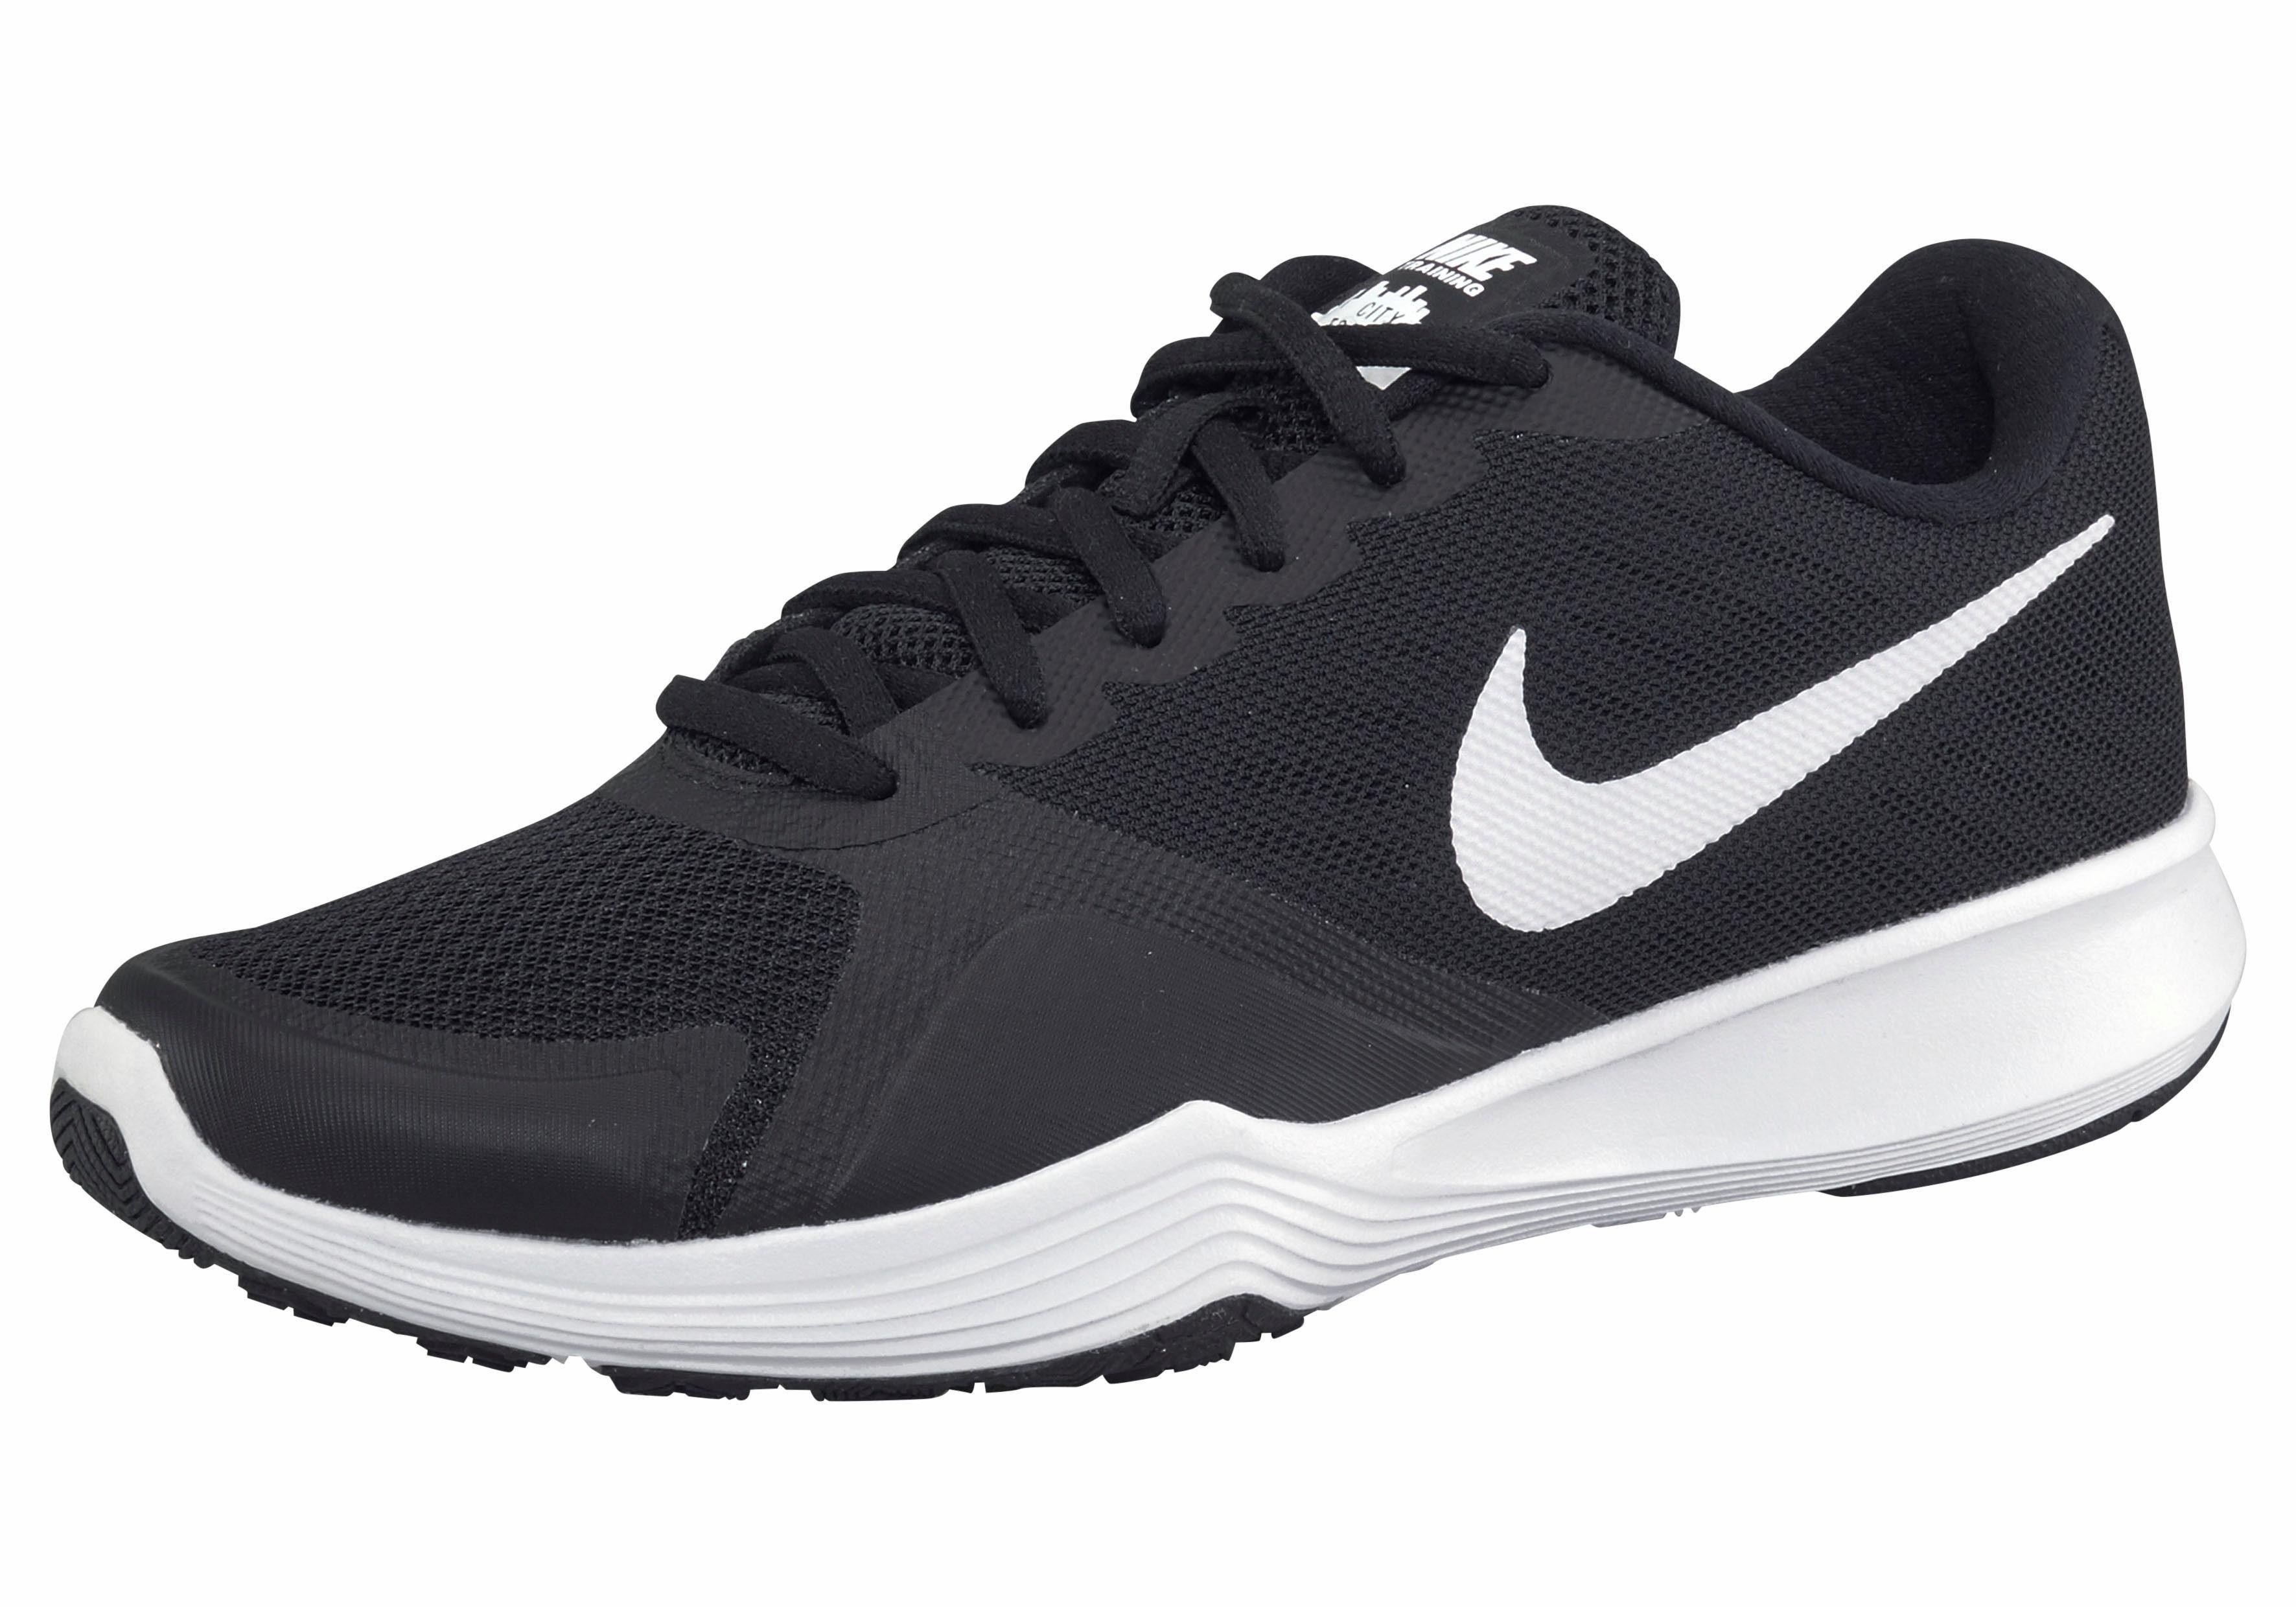 Fitness-schoenen Ignite Flash Evoknit Pumas iGoGwr5MP